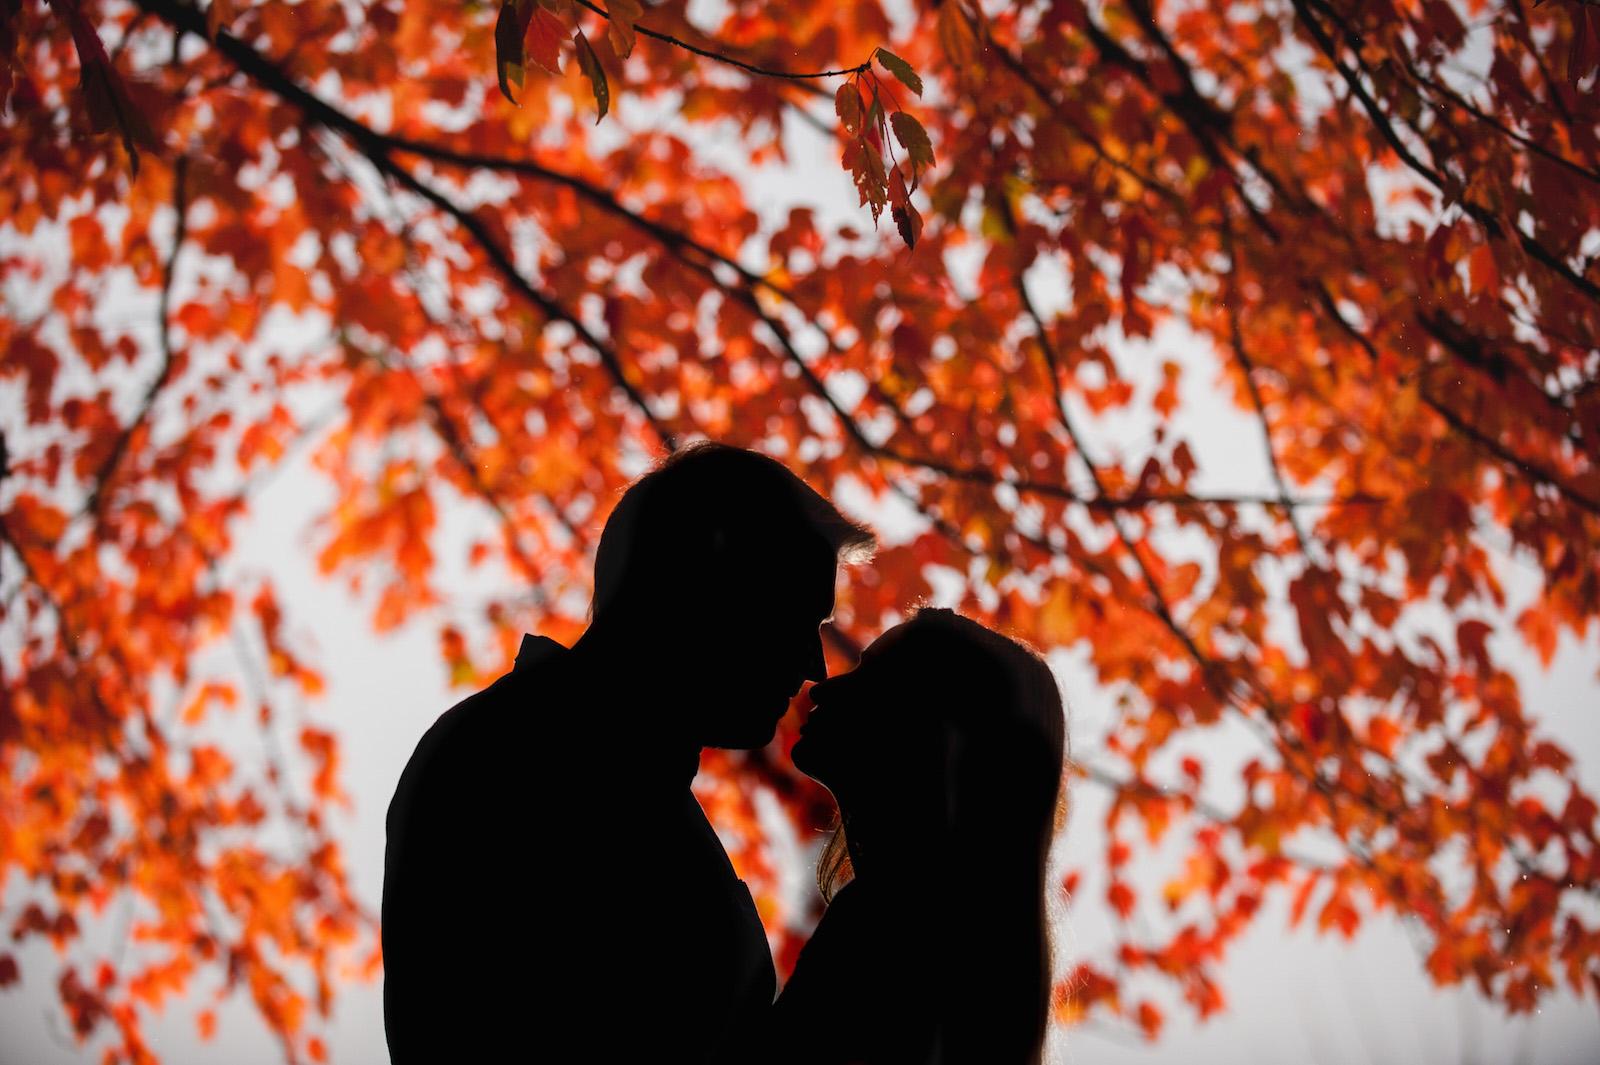 vancouver-island-wedding-photographers-rainy-stanley-park-engagement-11.jpg